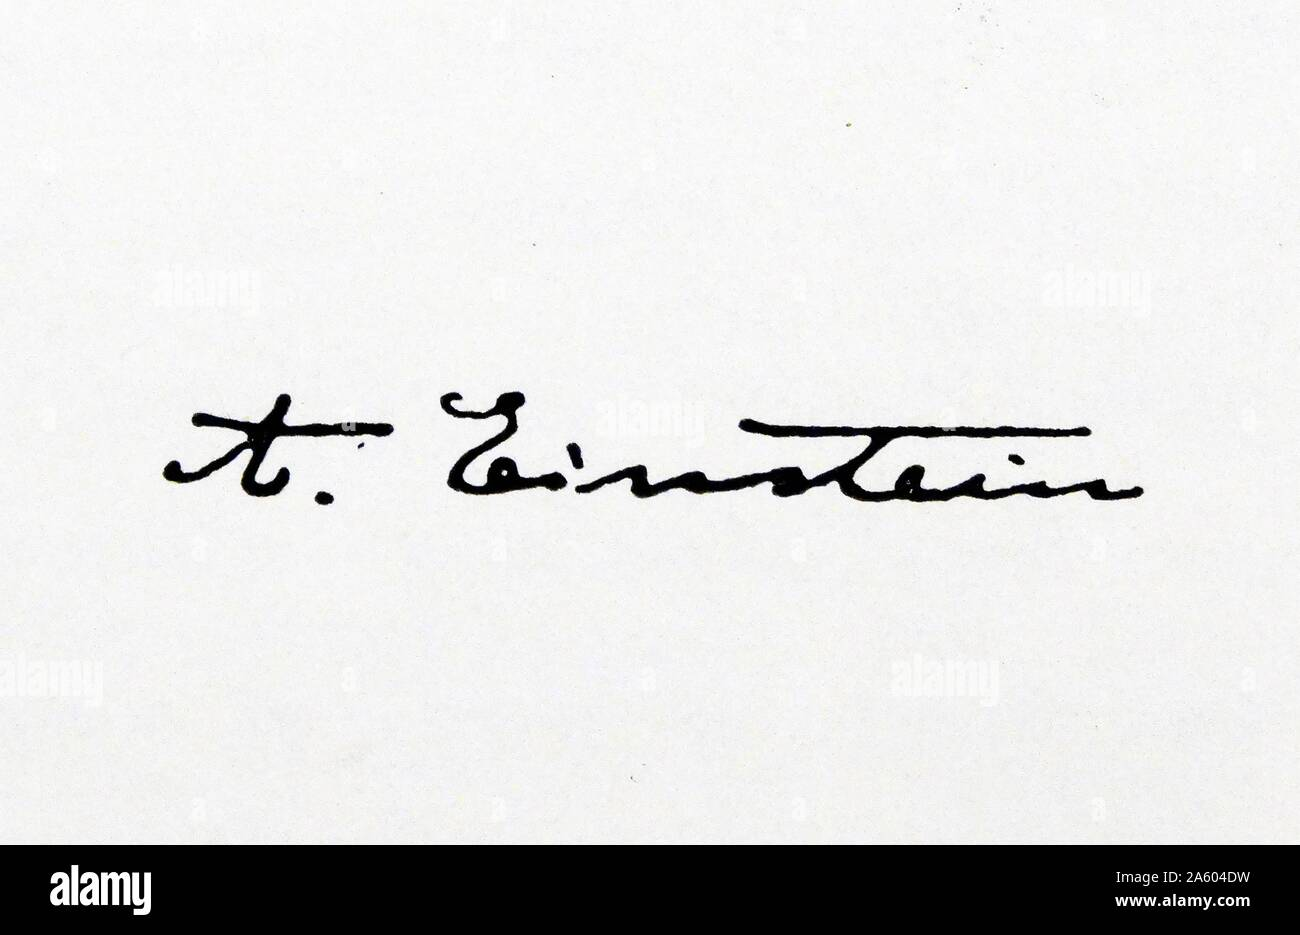 Signature of Albert Einstein (1879-1955) German-born theoretical physicist. Dated 20th Century Stock Photo